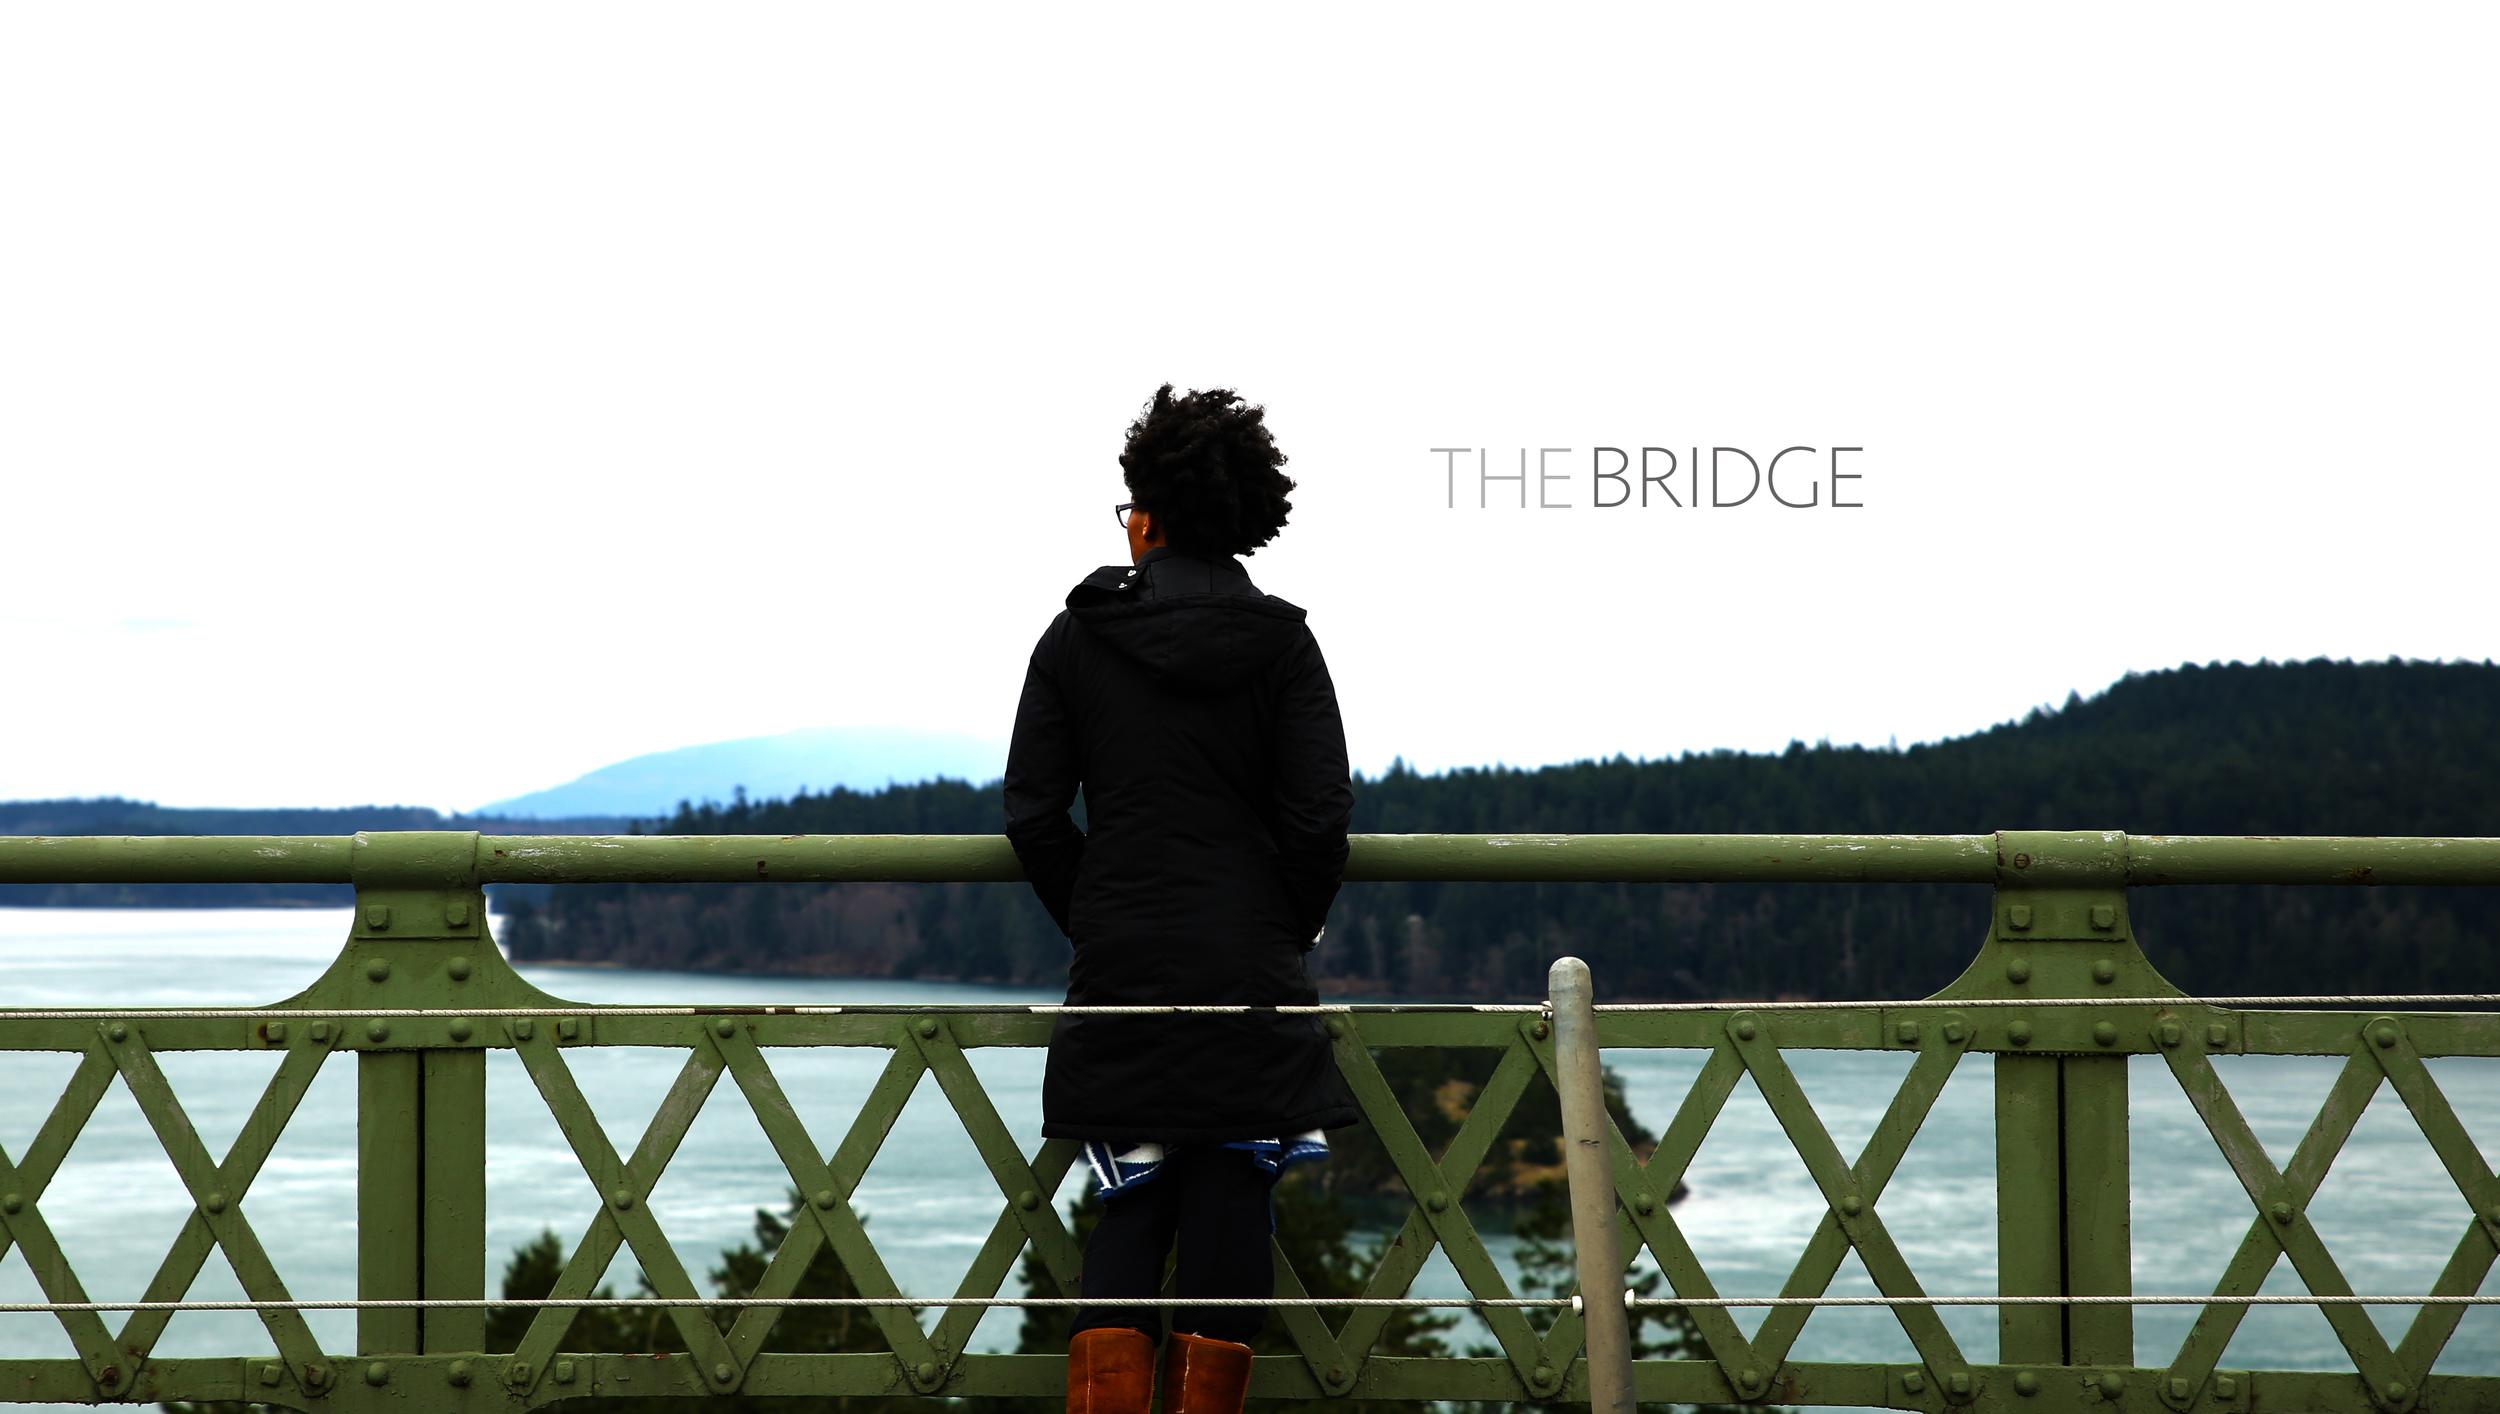 thebridge-still-photo-2.jpg